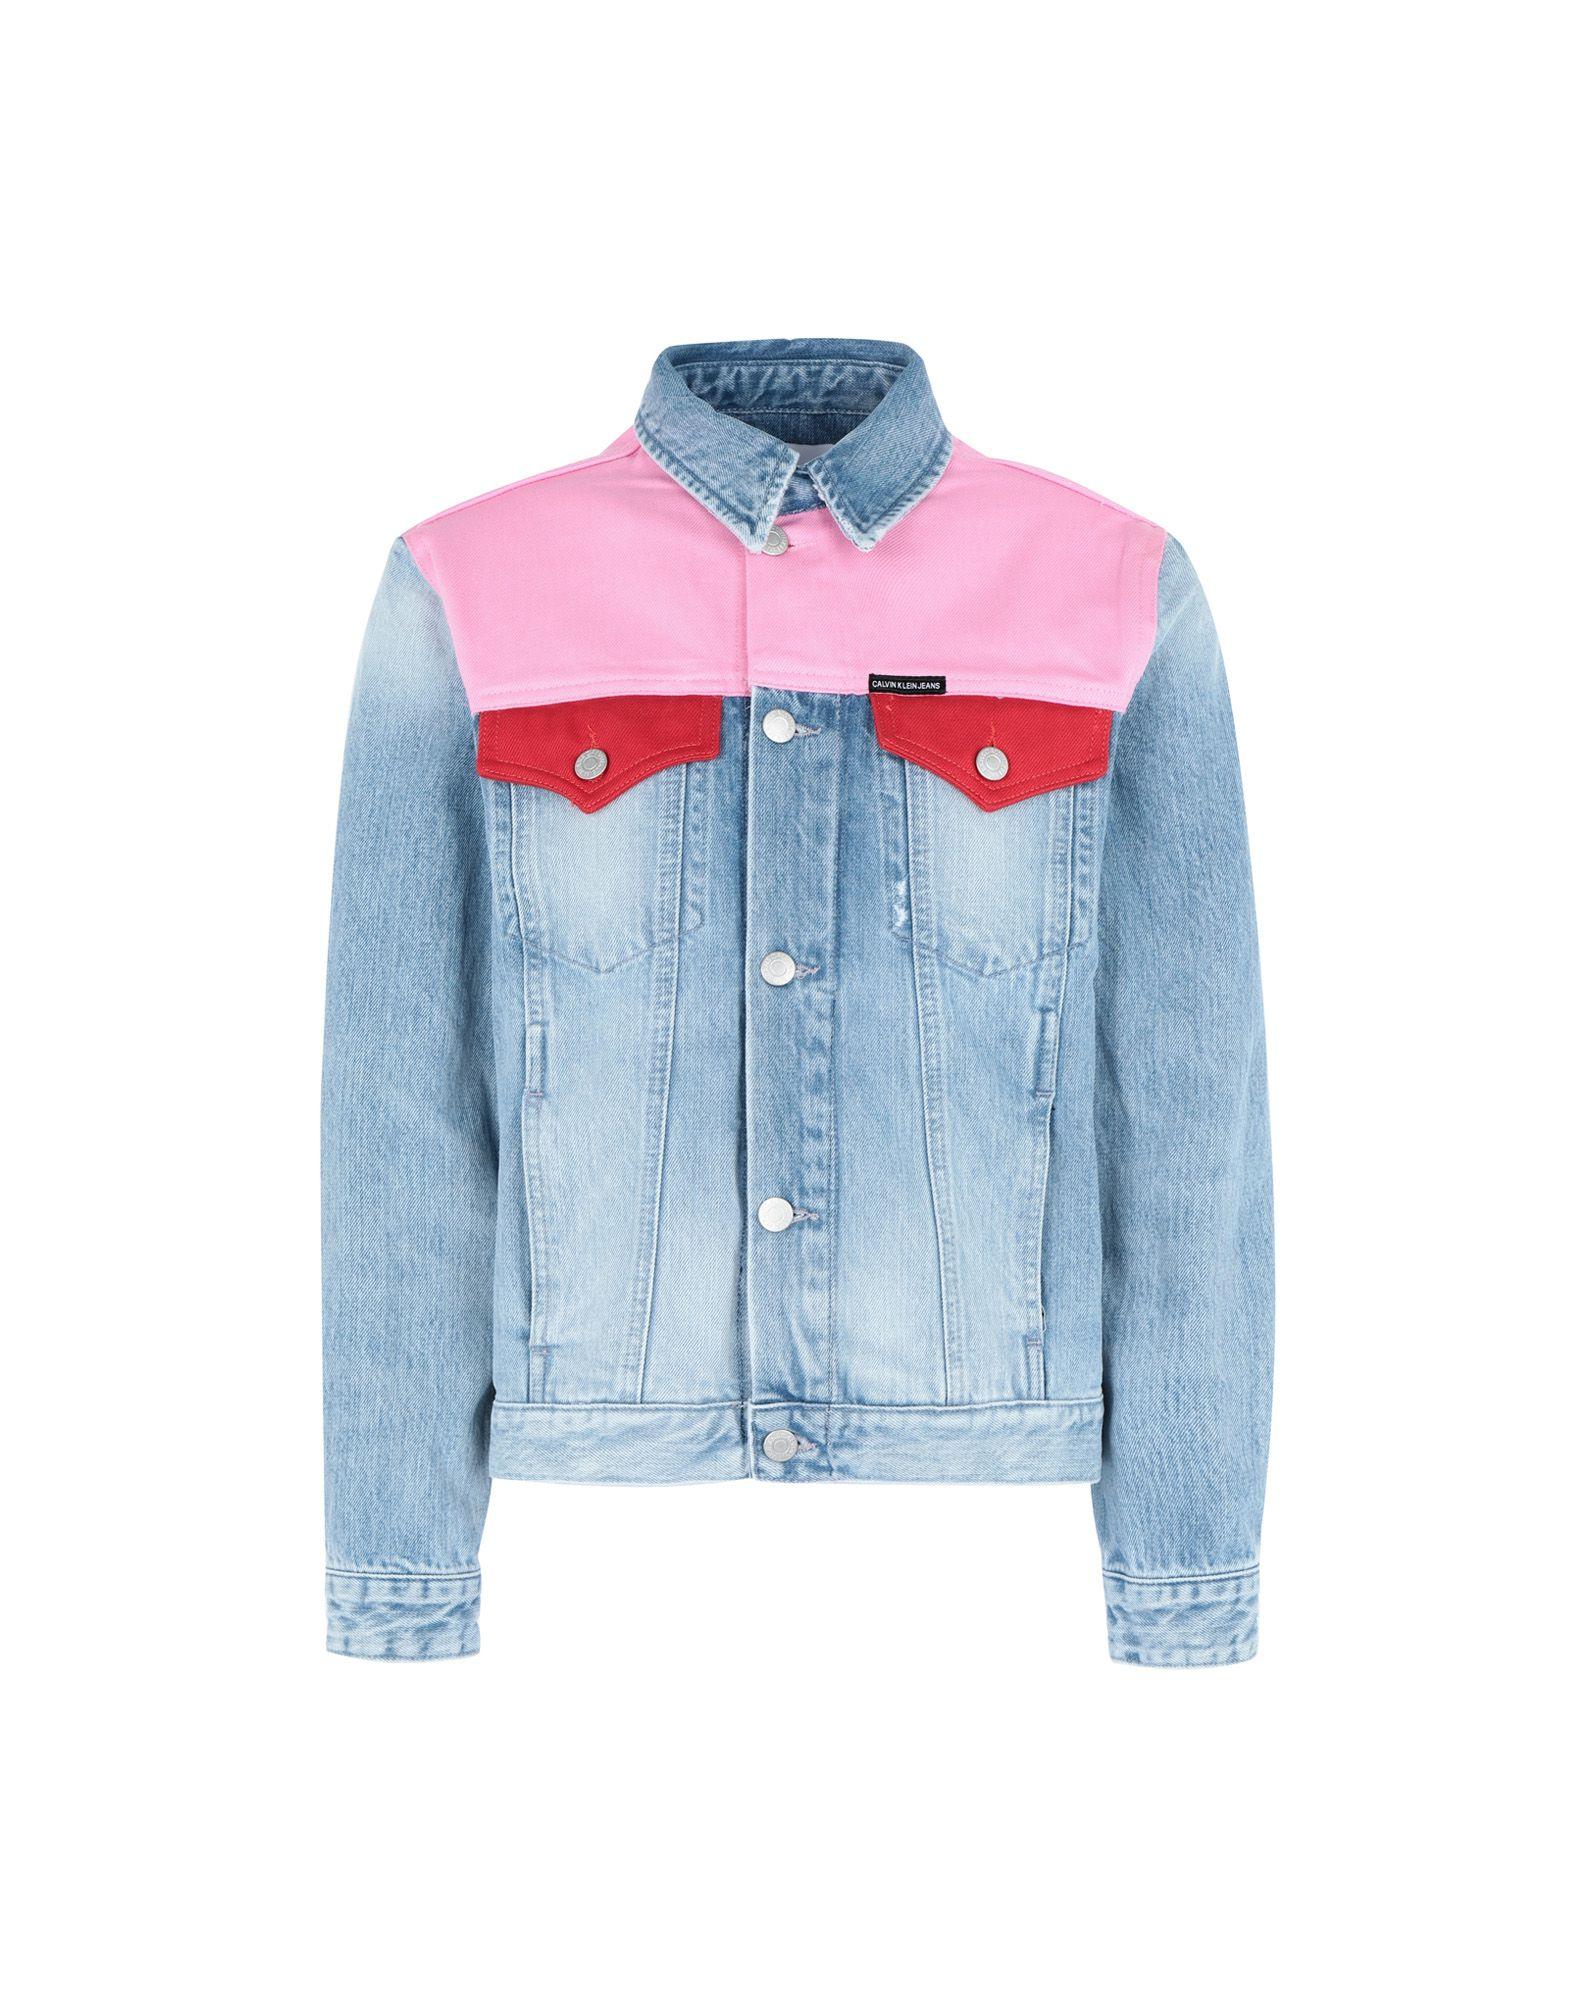 CALVIN KLEIN JEANS Джинсовая верхняя одежда calvin klein jeans джинсовая верхняя одежда